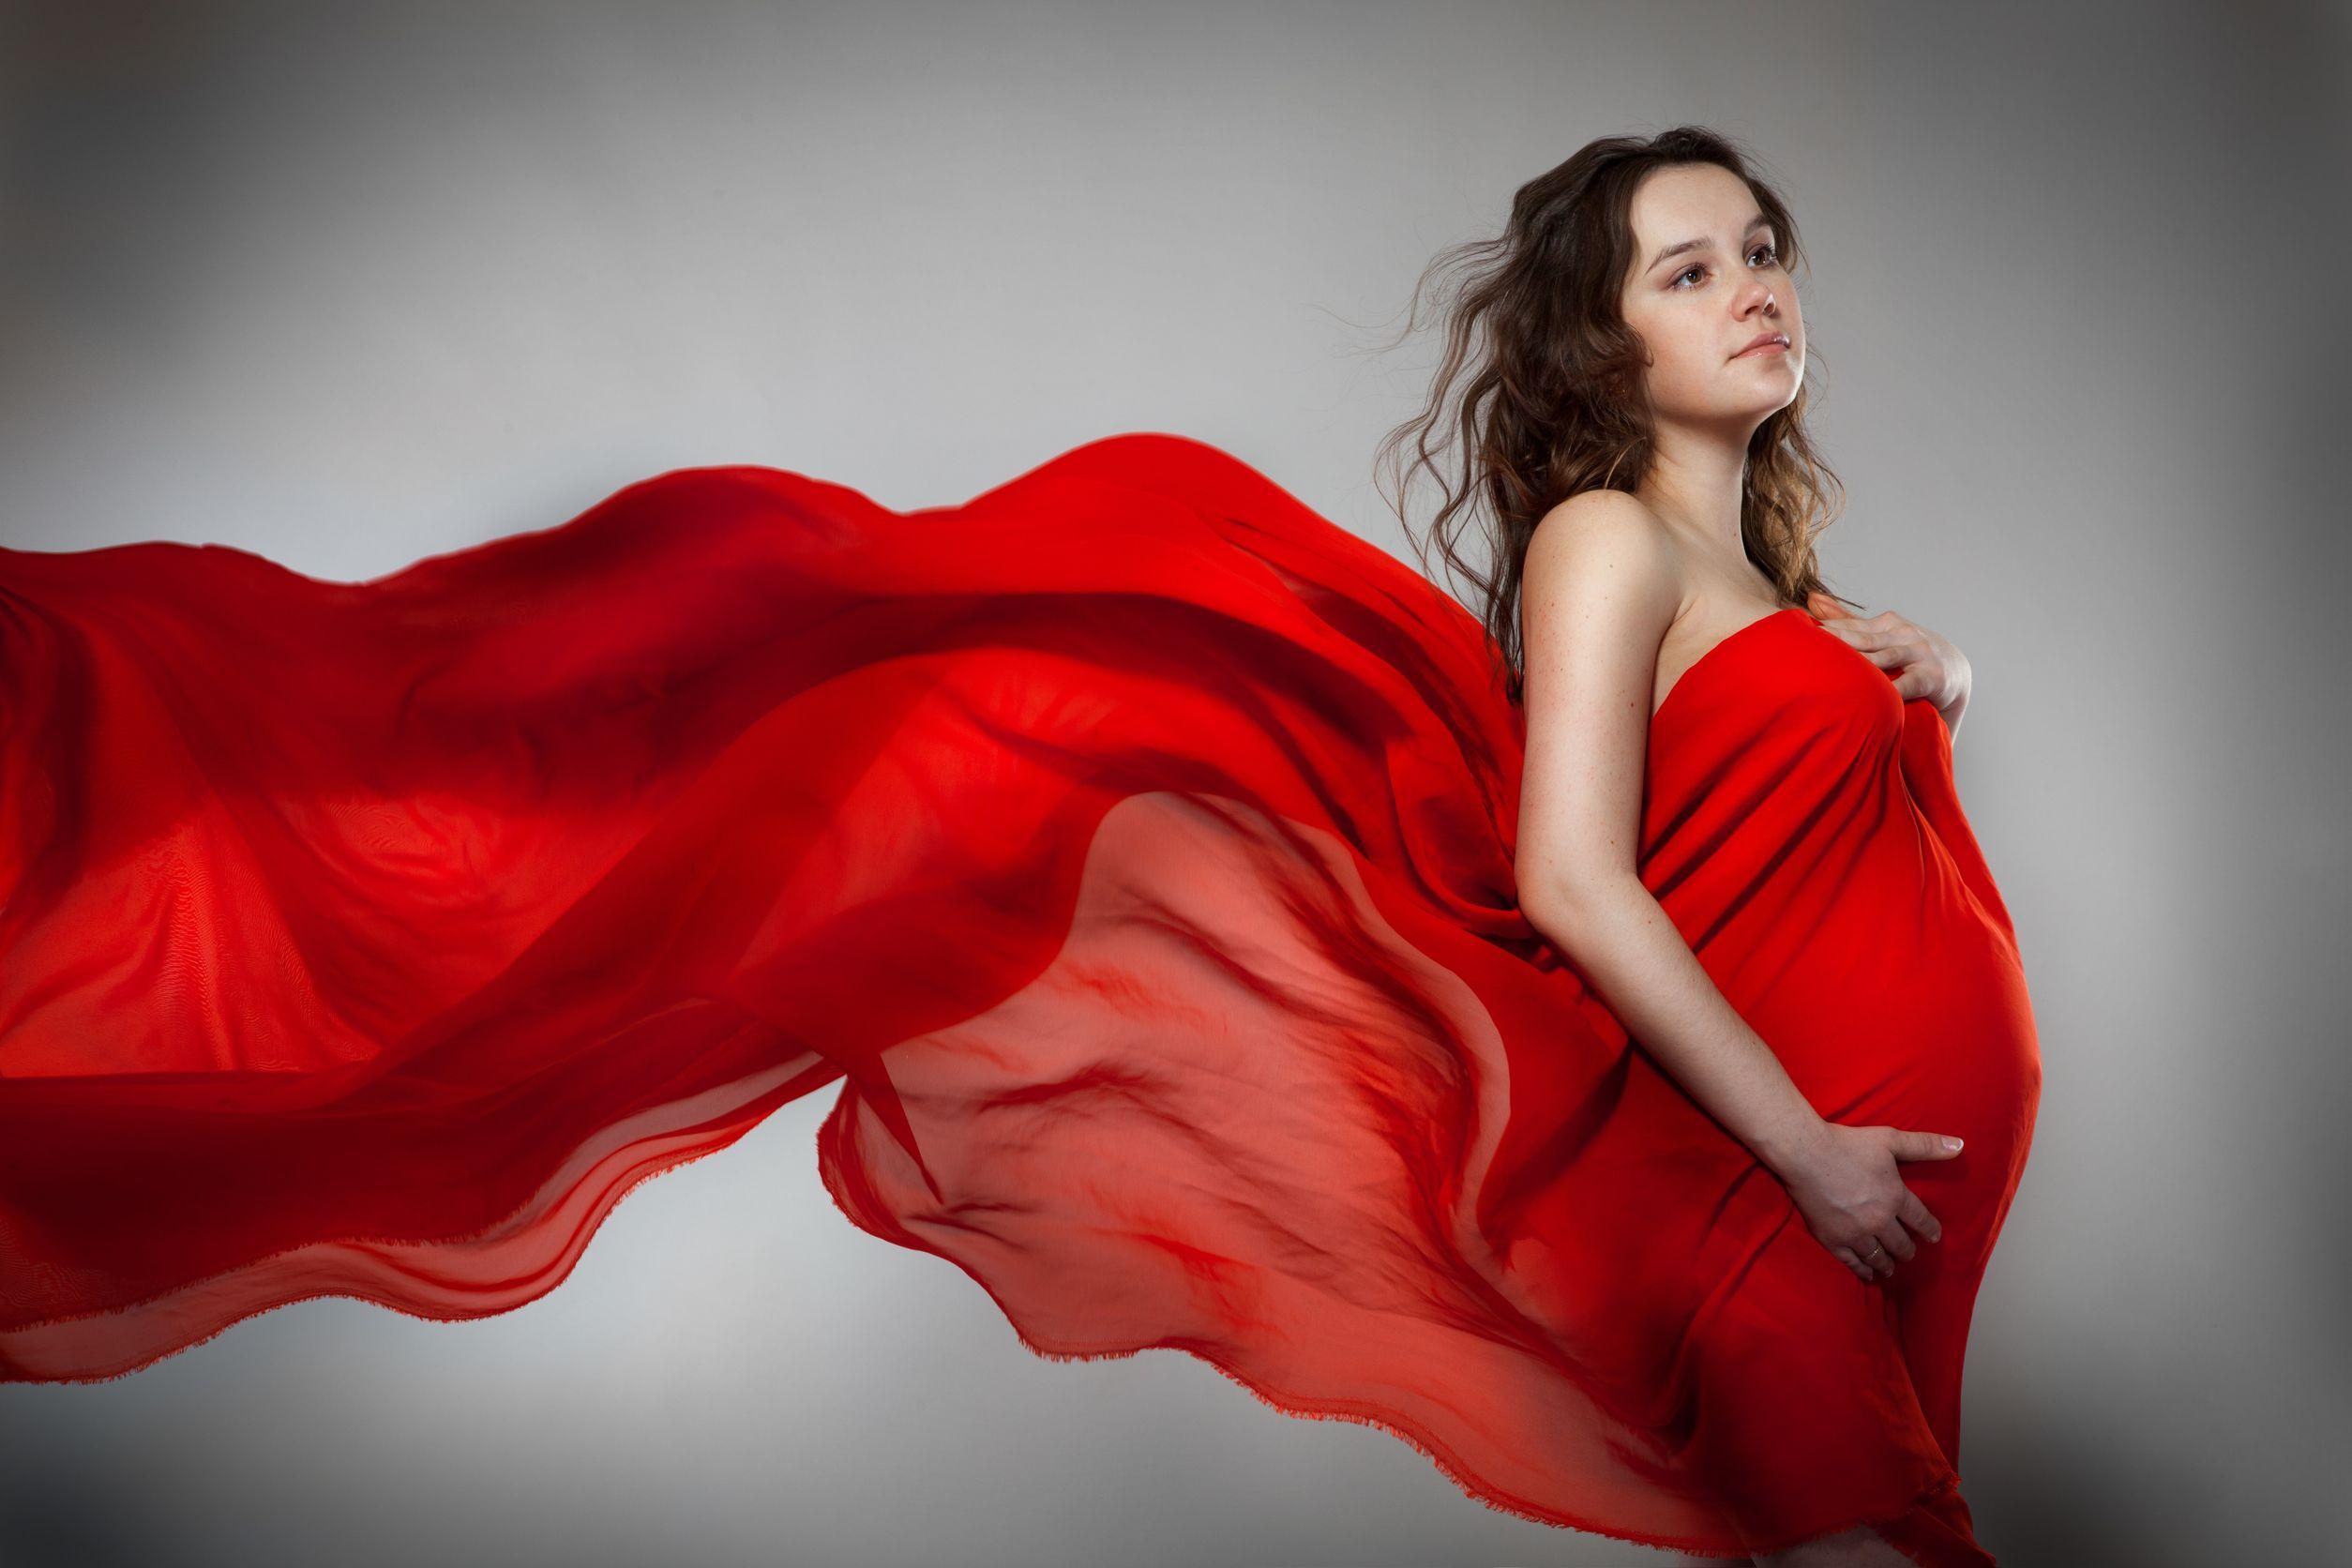 Saffron-during-Pregnancy-Saffron-for-Pregnant-Women-Ladies-Saffron-Milk-First-Second-Third-Trimester